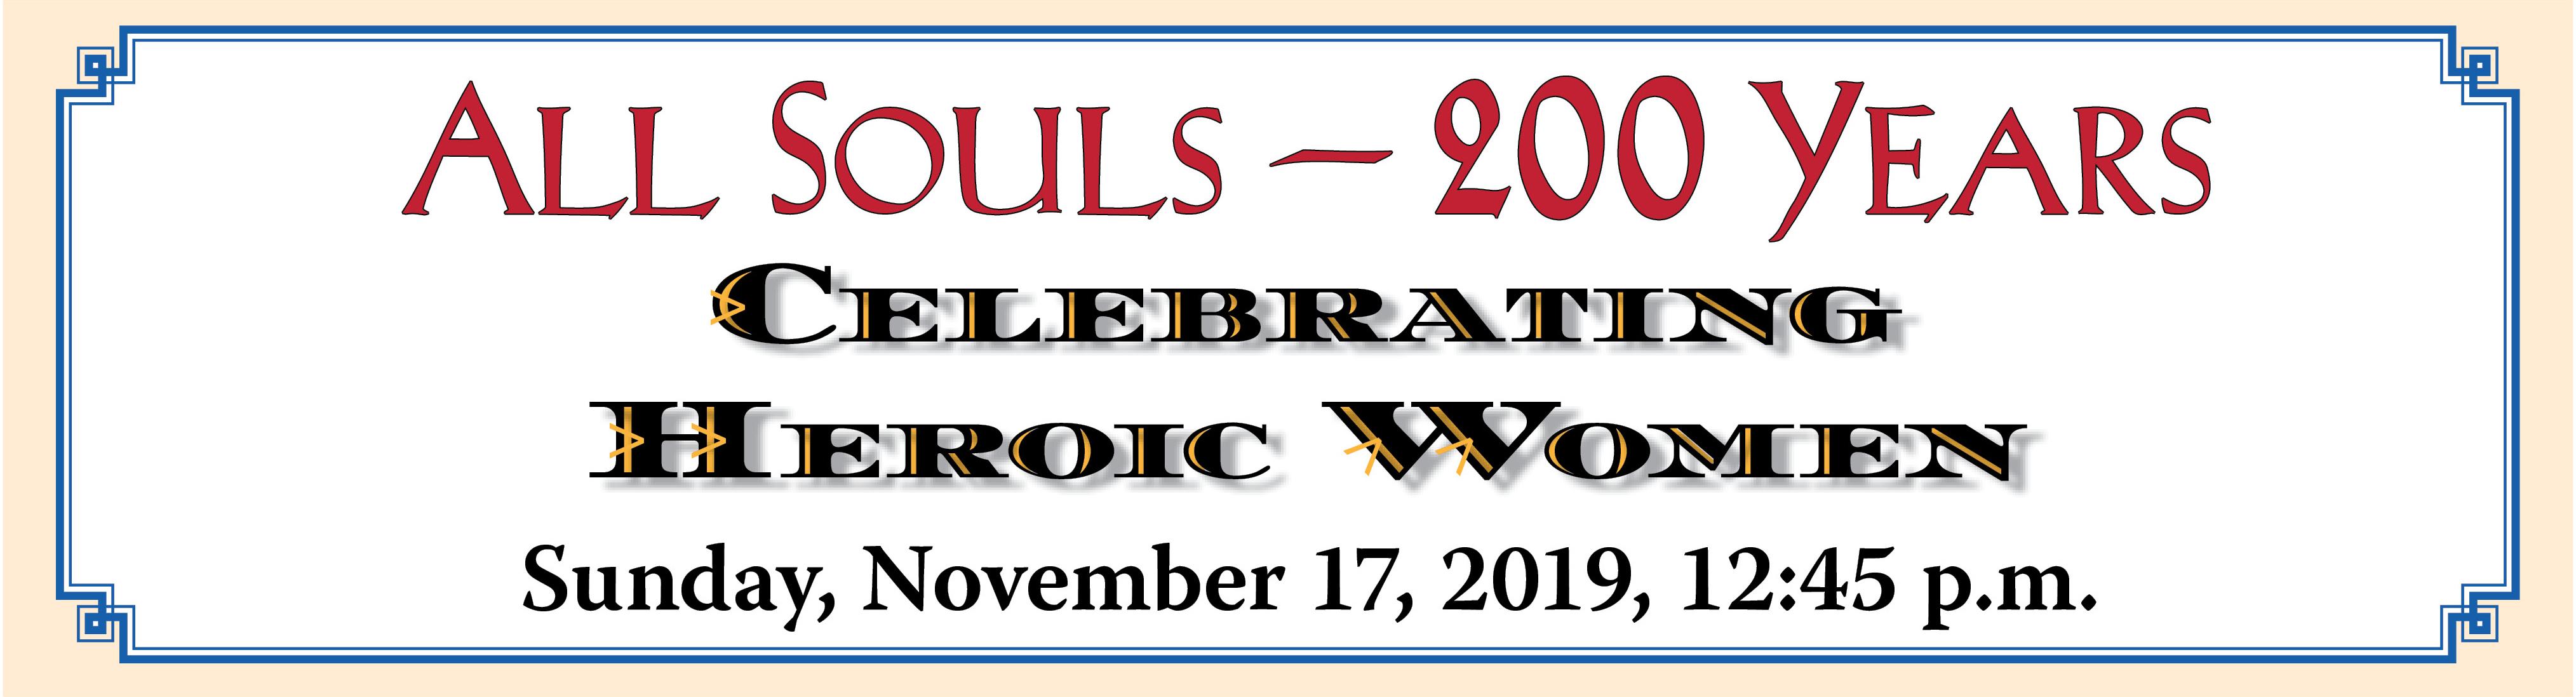 all souls at 200 celebrating heroic women tableaux vivants sunday november 17 at 12:45 pm